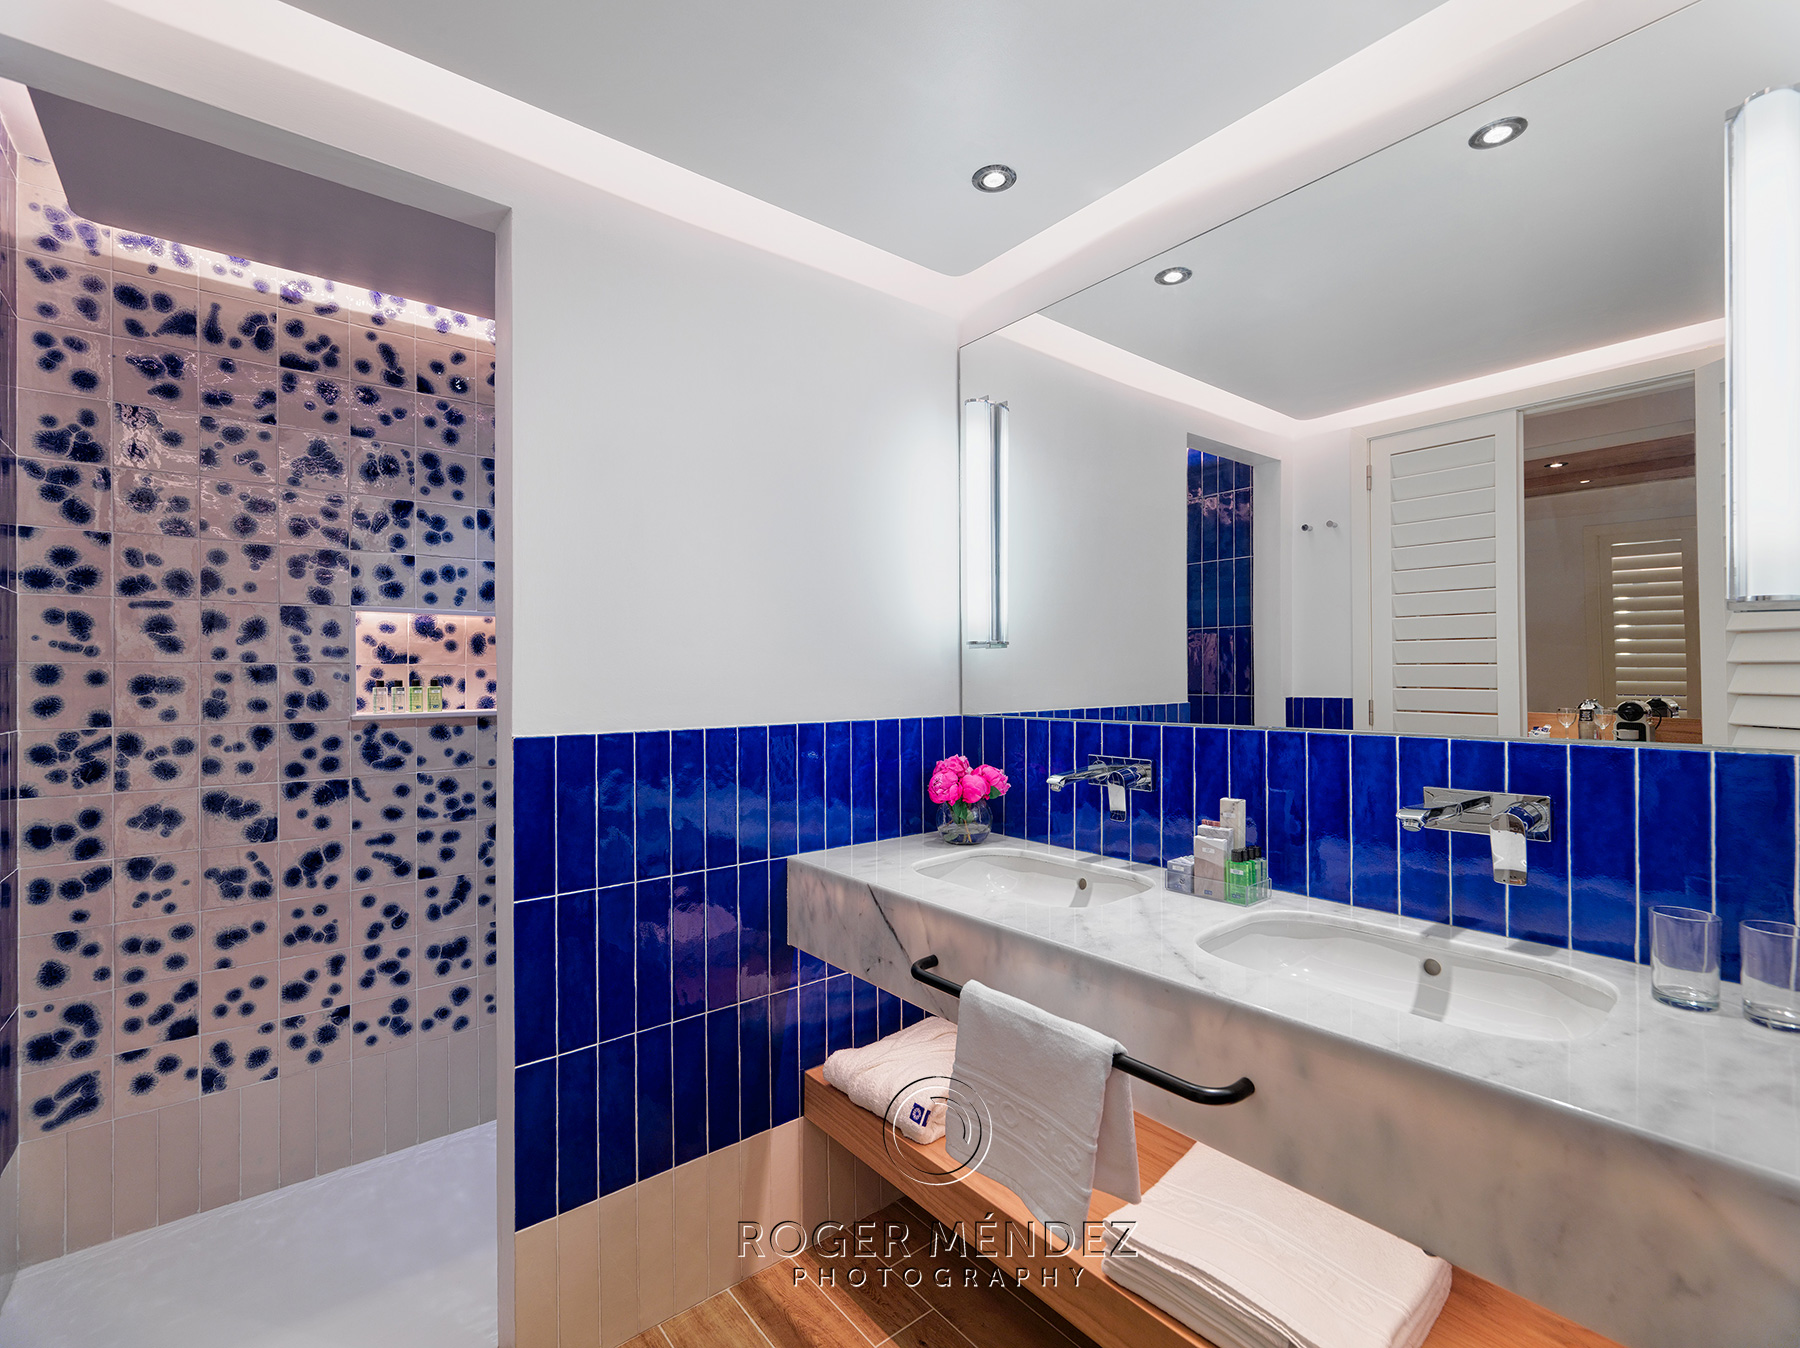 Model room bathroom photo